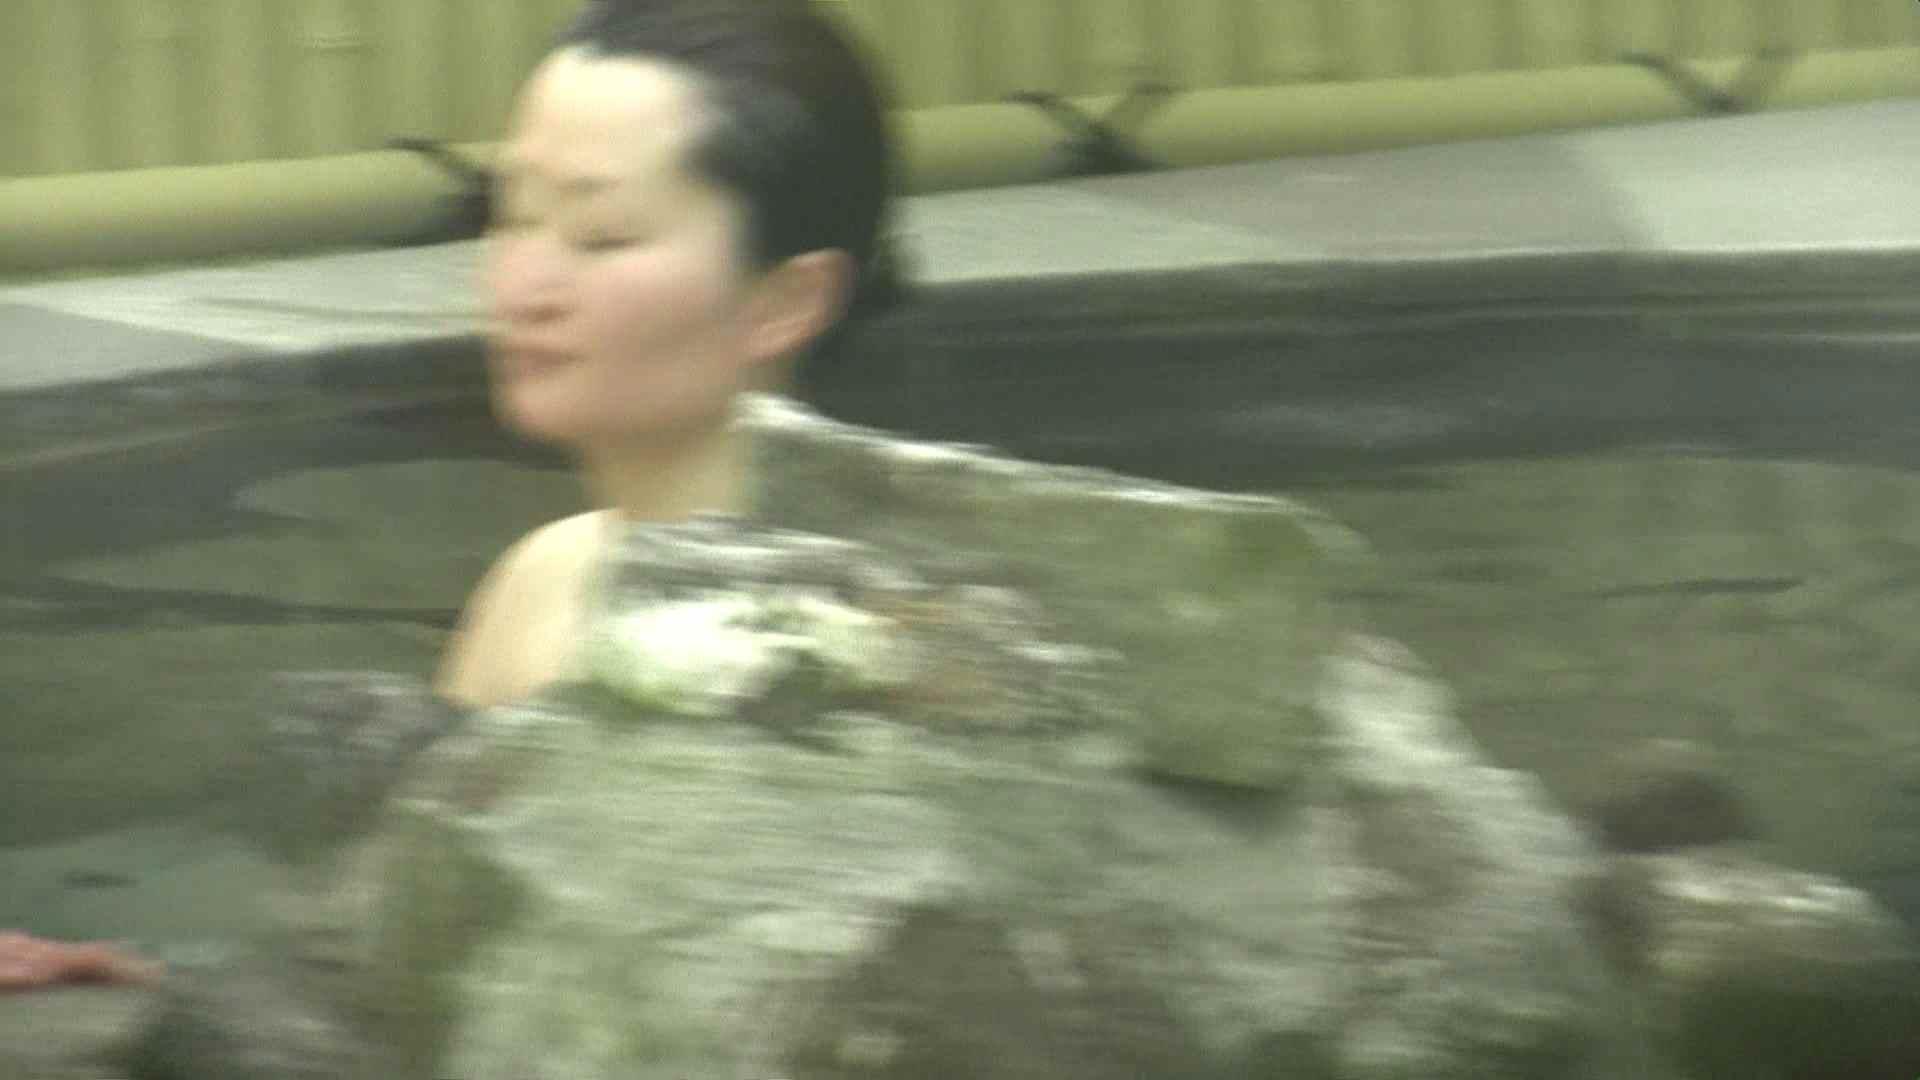 Aquaな露天風呂Vol.632 盗撮 | OLセックス  70画像 37